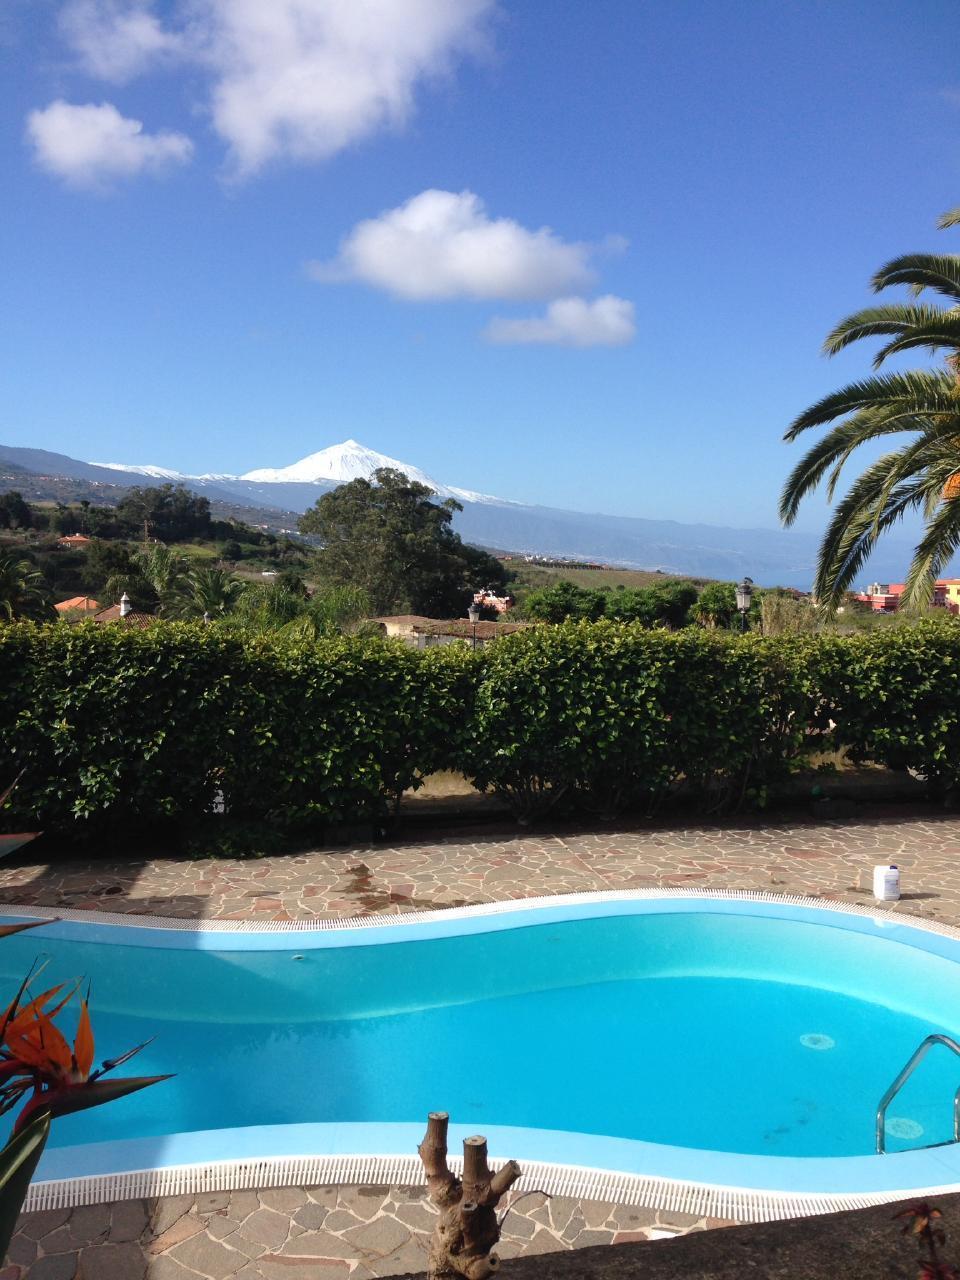 Maison de vacances Casita auf luxuriöser Finca in idyllischer Lage, Whirlpool, Atlantik- und Teidepanorama (2397261), Tacoronte, Ténérife, Iles Canaries, Espagne, image 20